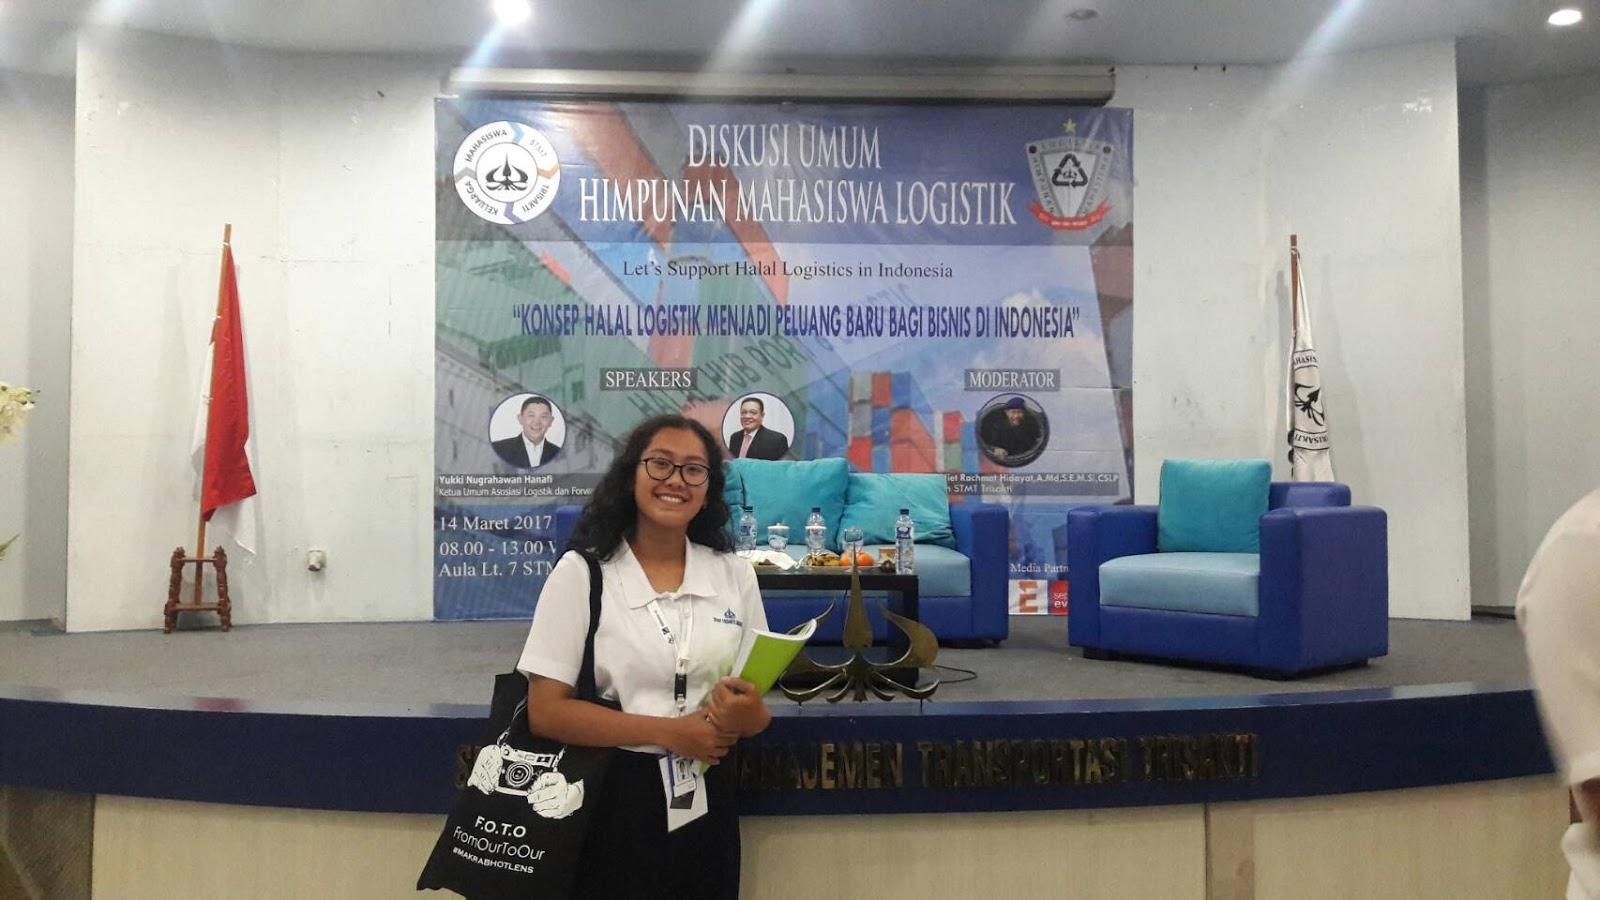 Aprina Elisabeth Angelina Ghita Top Putih Diskusi Umum Himpunan Mahasiswa Logistik 2017